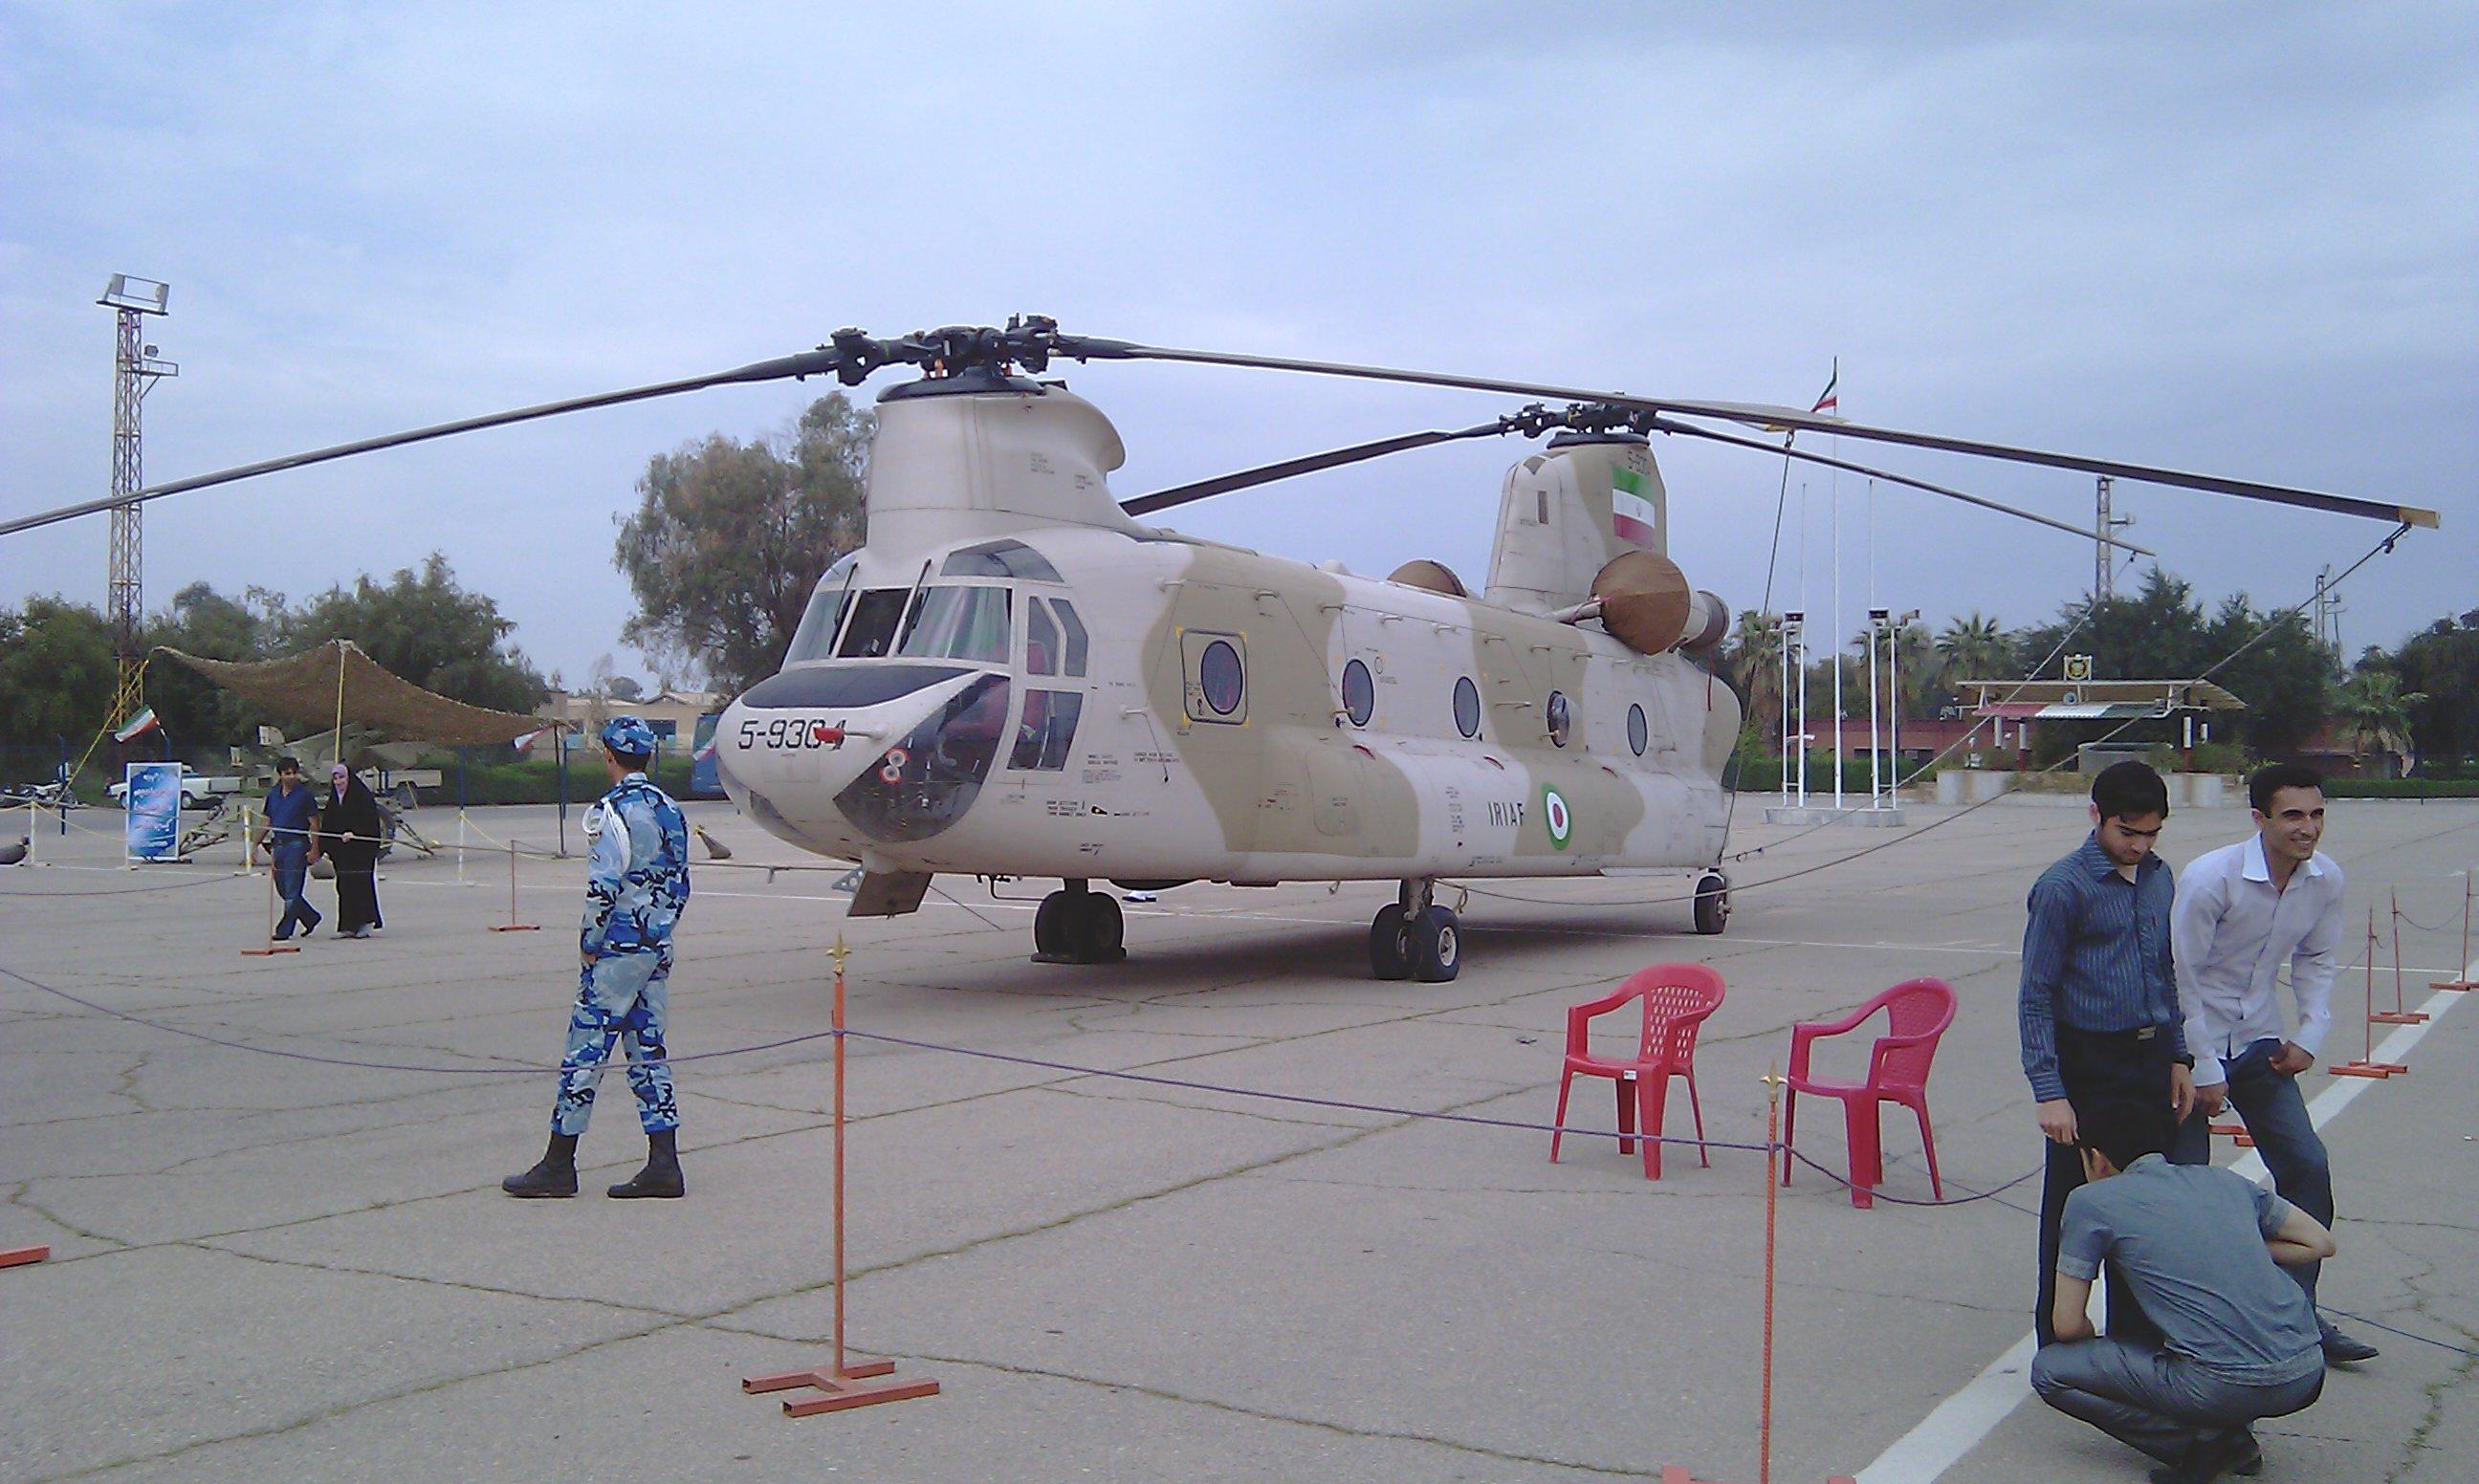 تصویر: http://behnamdk.persiangig.com/air%20plane/IMAG0339.jpg